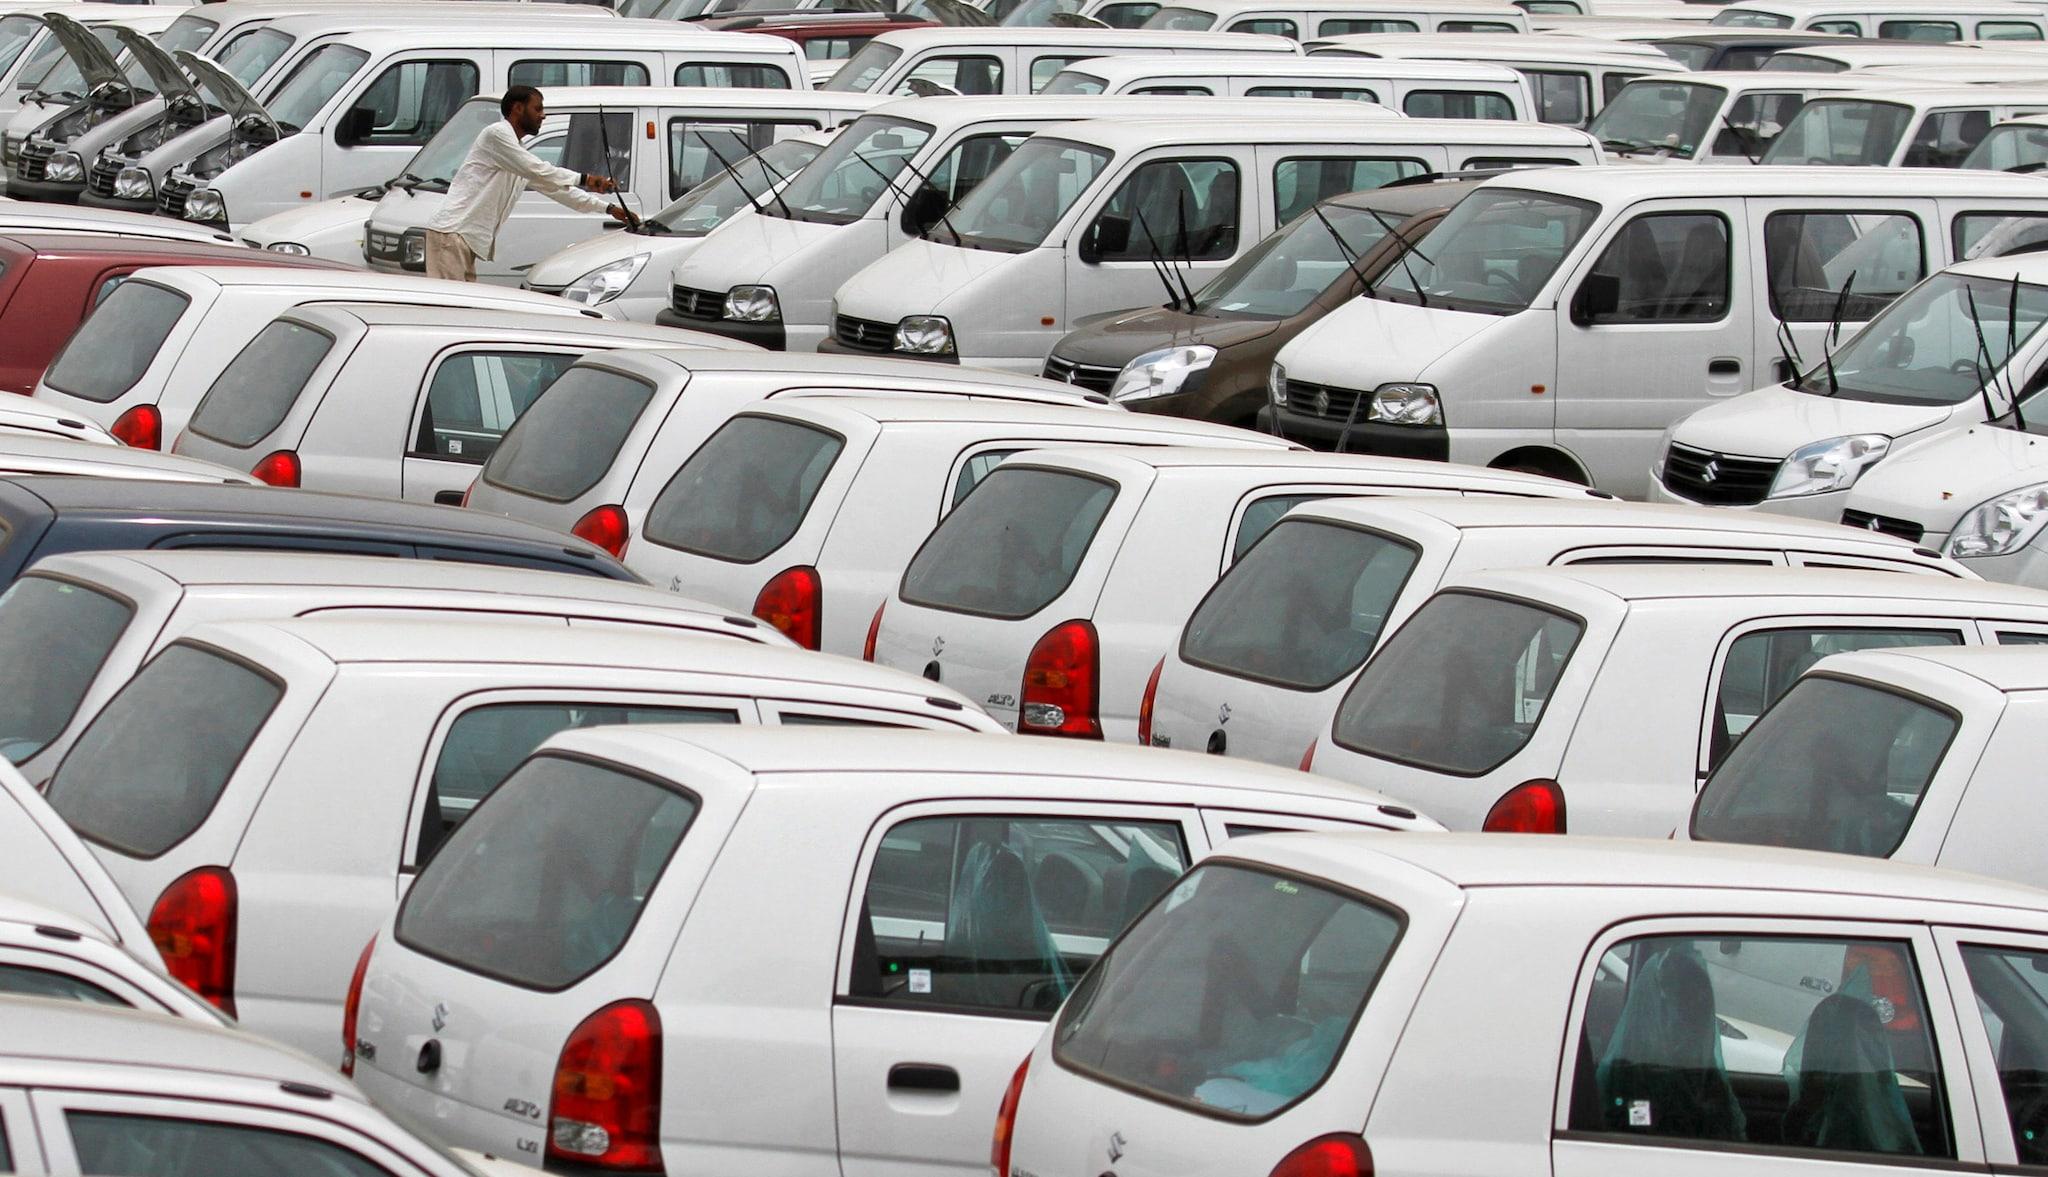 ACMA on Auto Slowdown: According to Automotive Component Manufacturers Association of India (ACMA) President Ram Venkataramani, the sector is going through a rough phase.